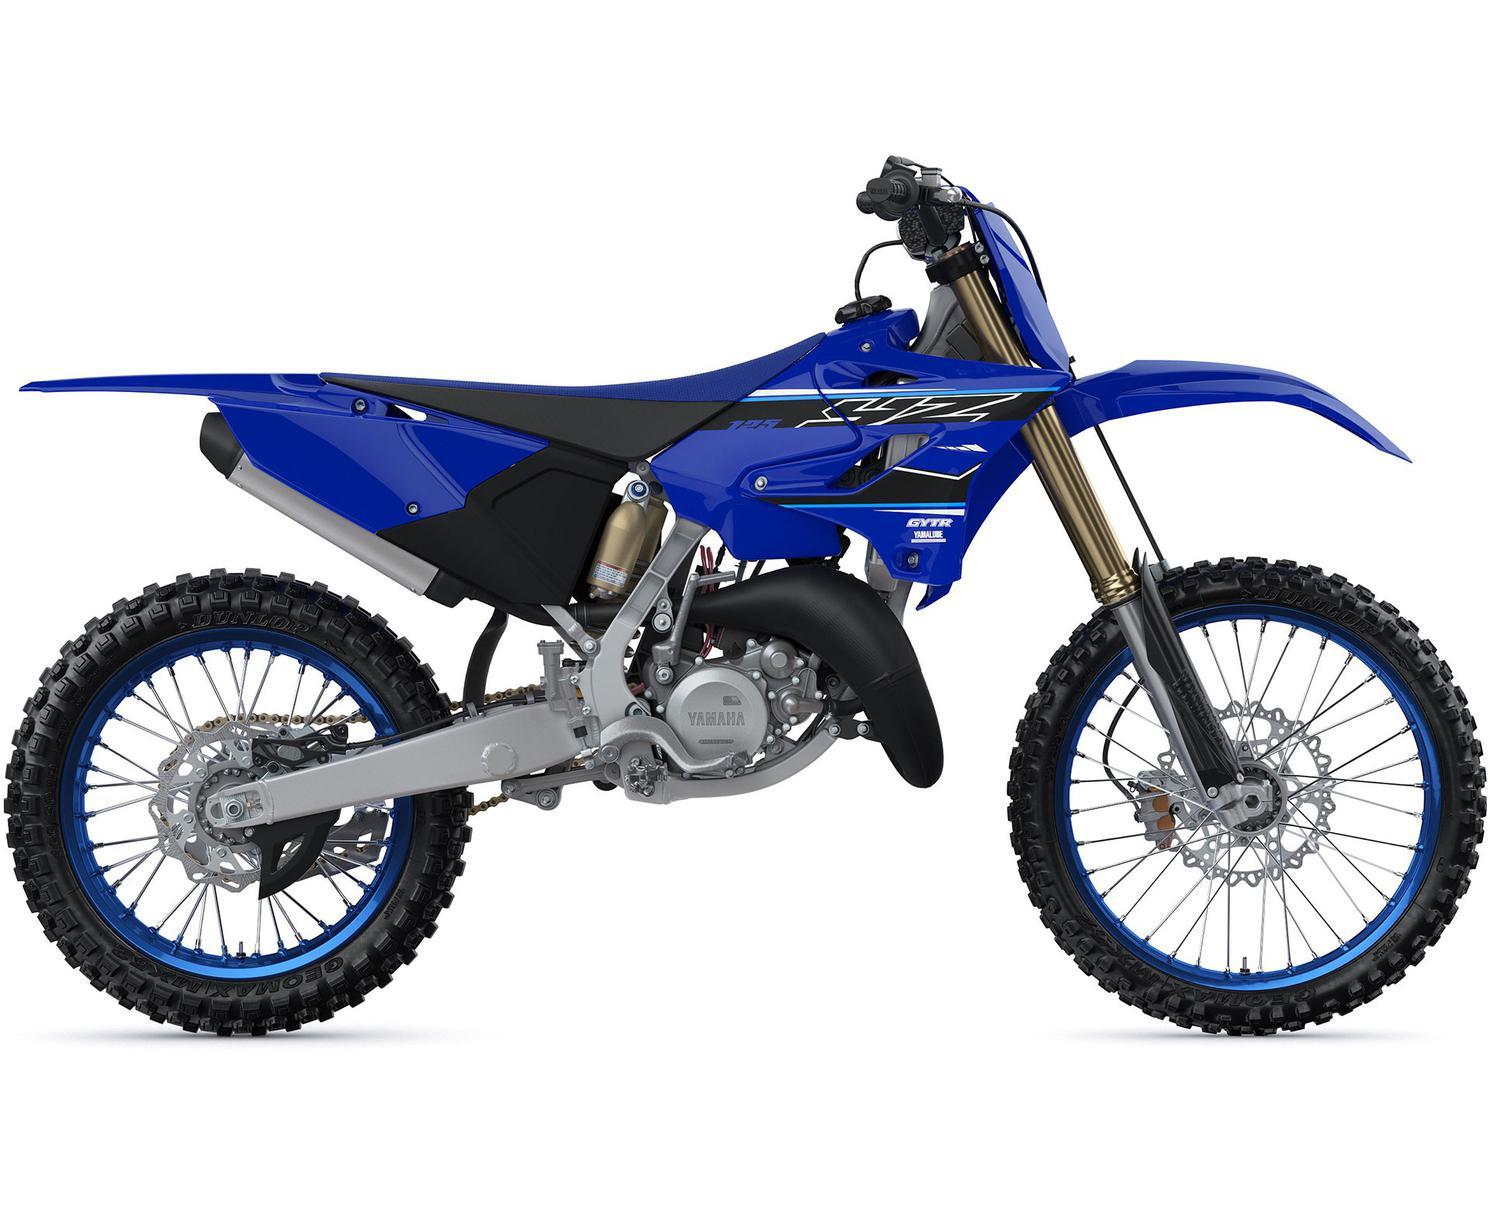 2021 Yamaha YZ125 Yamaha Racing Blue